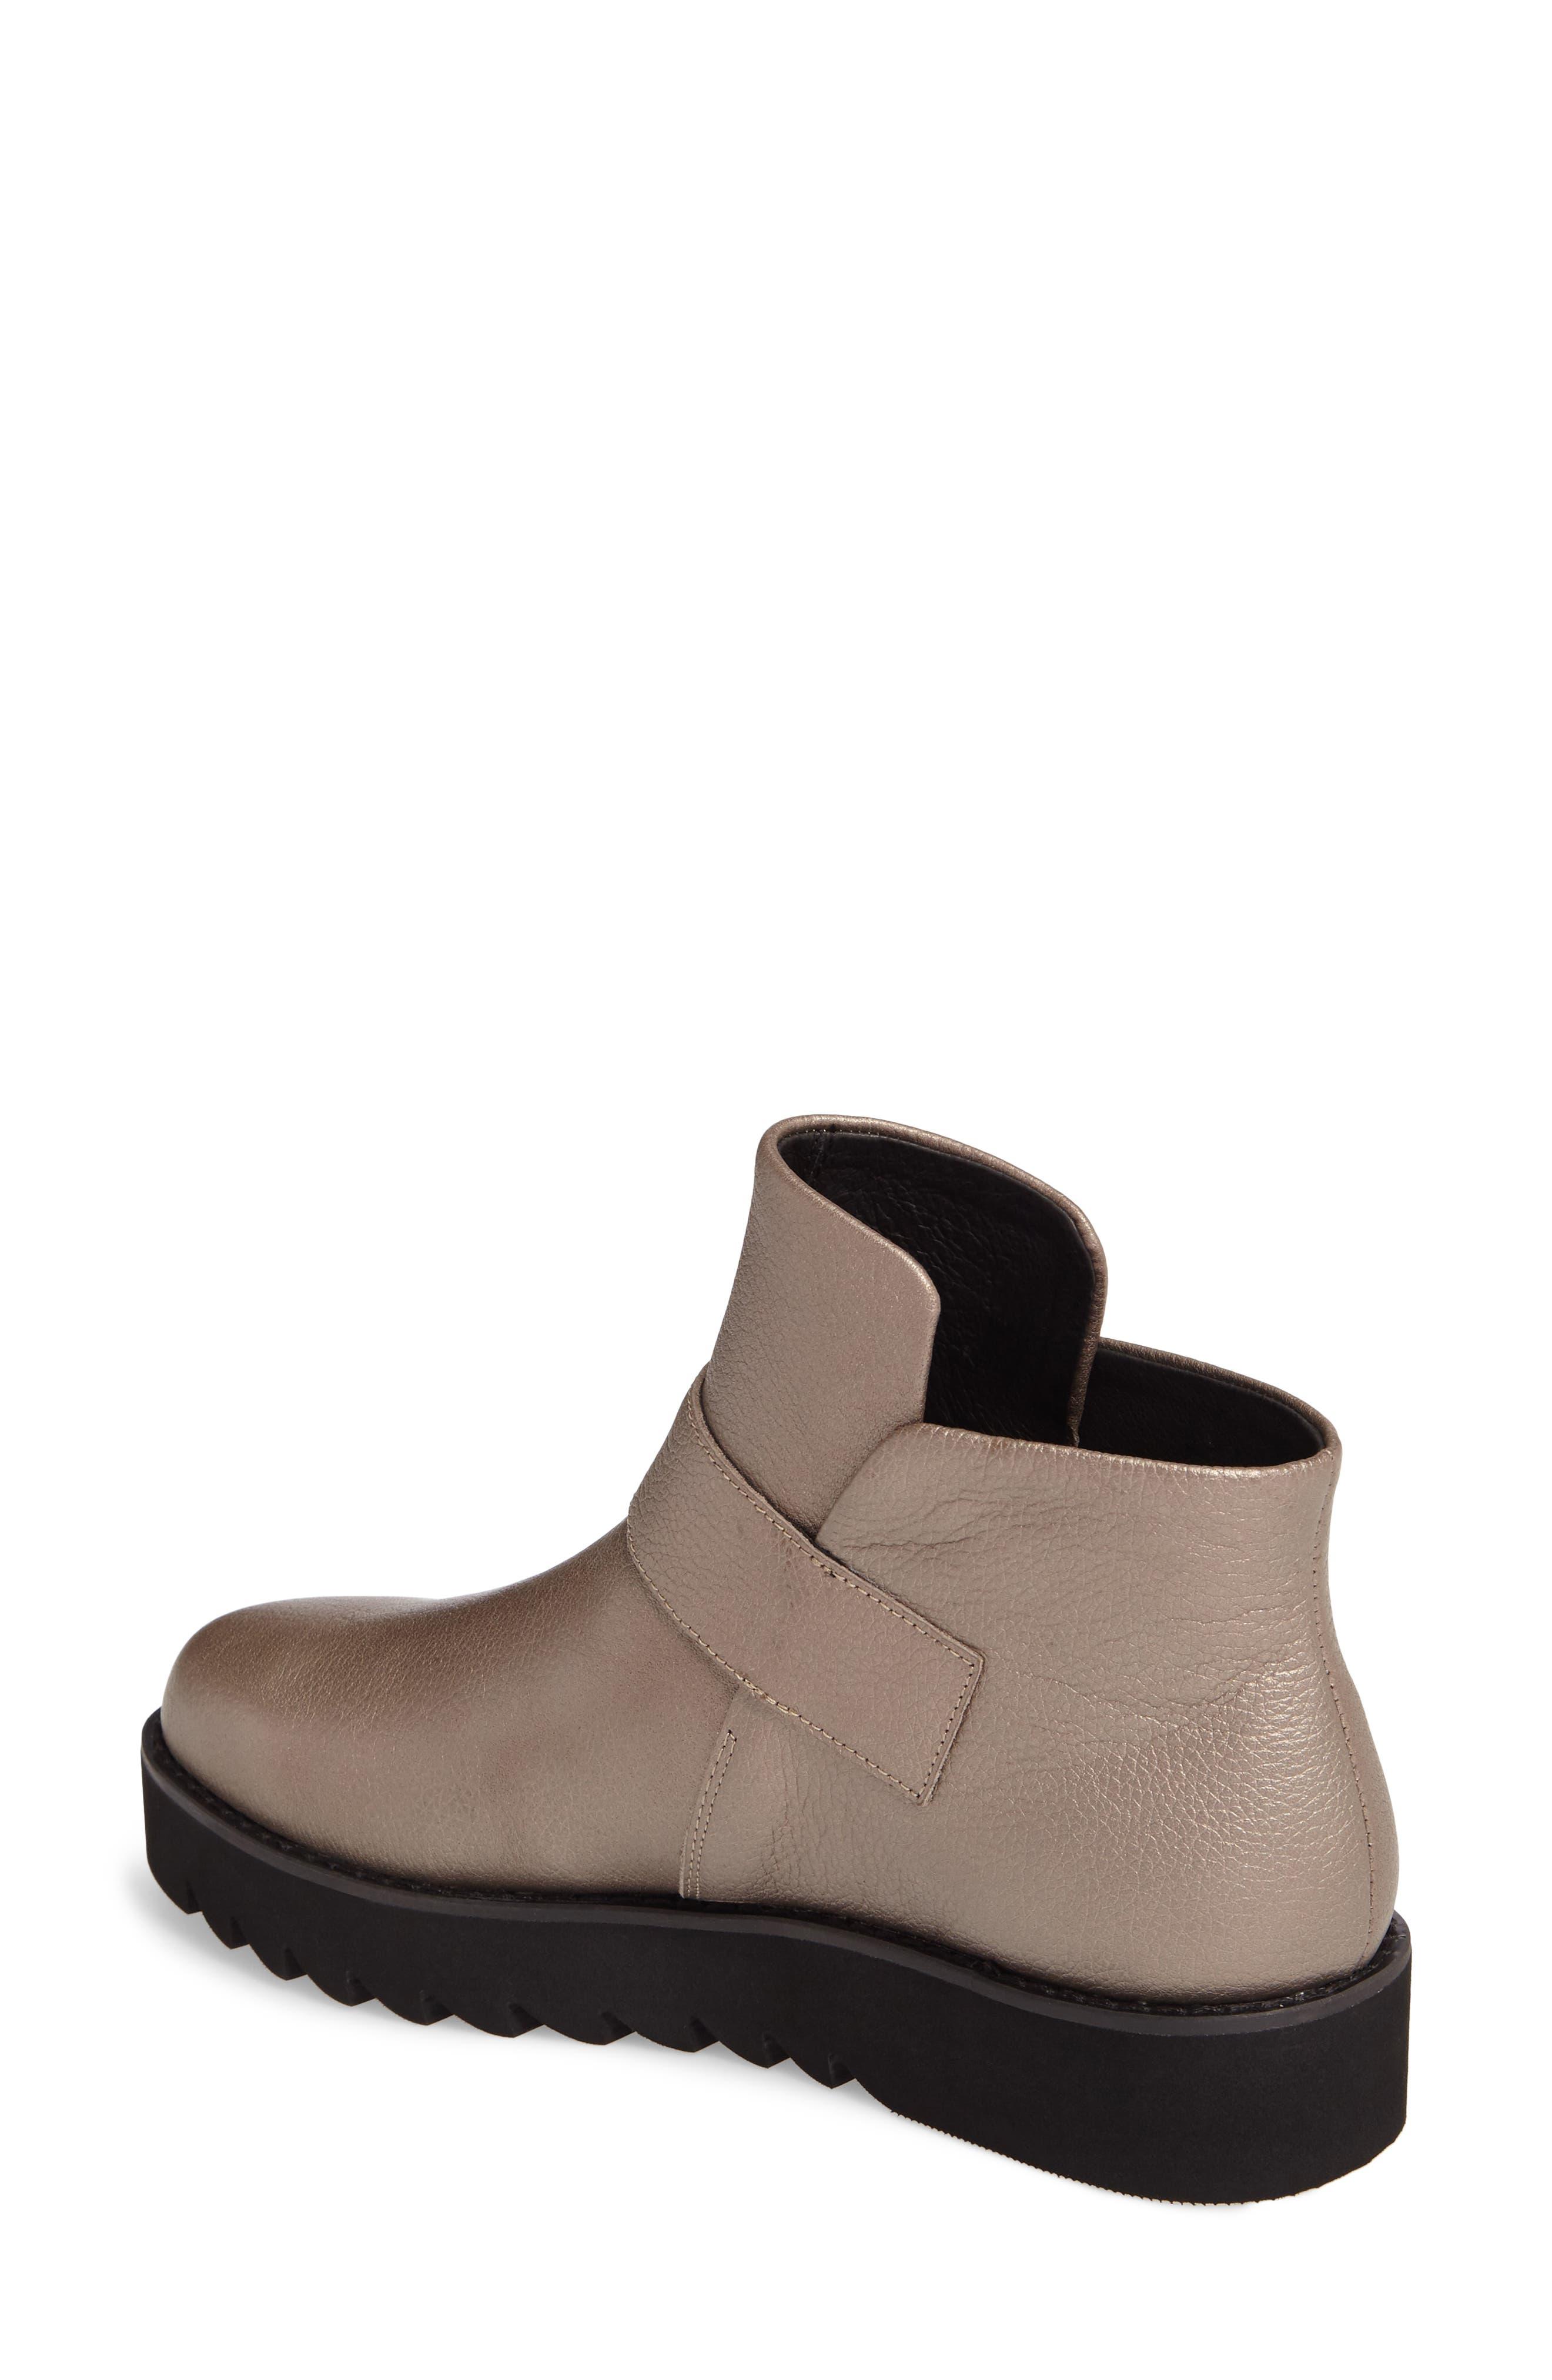 Kris Boot,                             Alternate thumbnail 2, color,                             Copper Leather